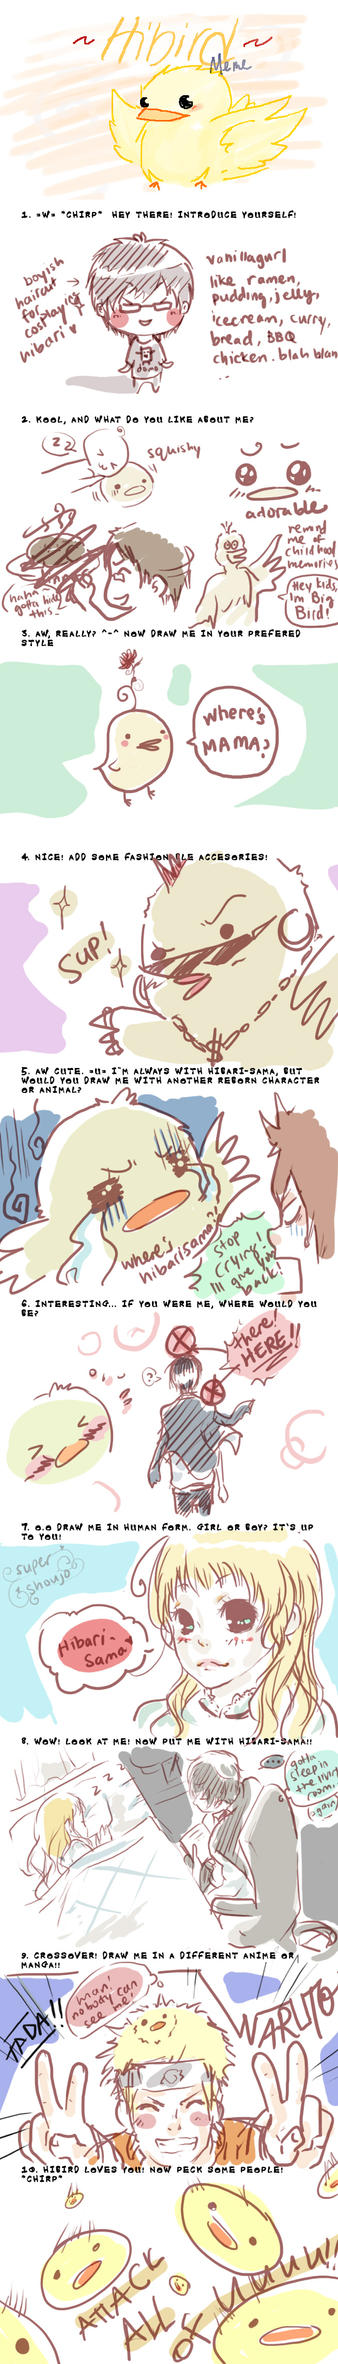 Hibird Meme by v4n1ll4gur1